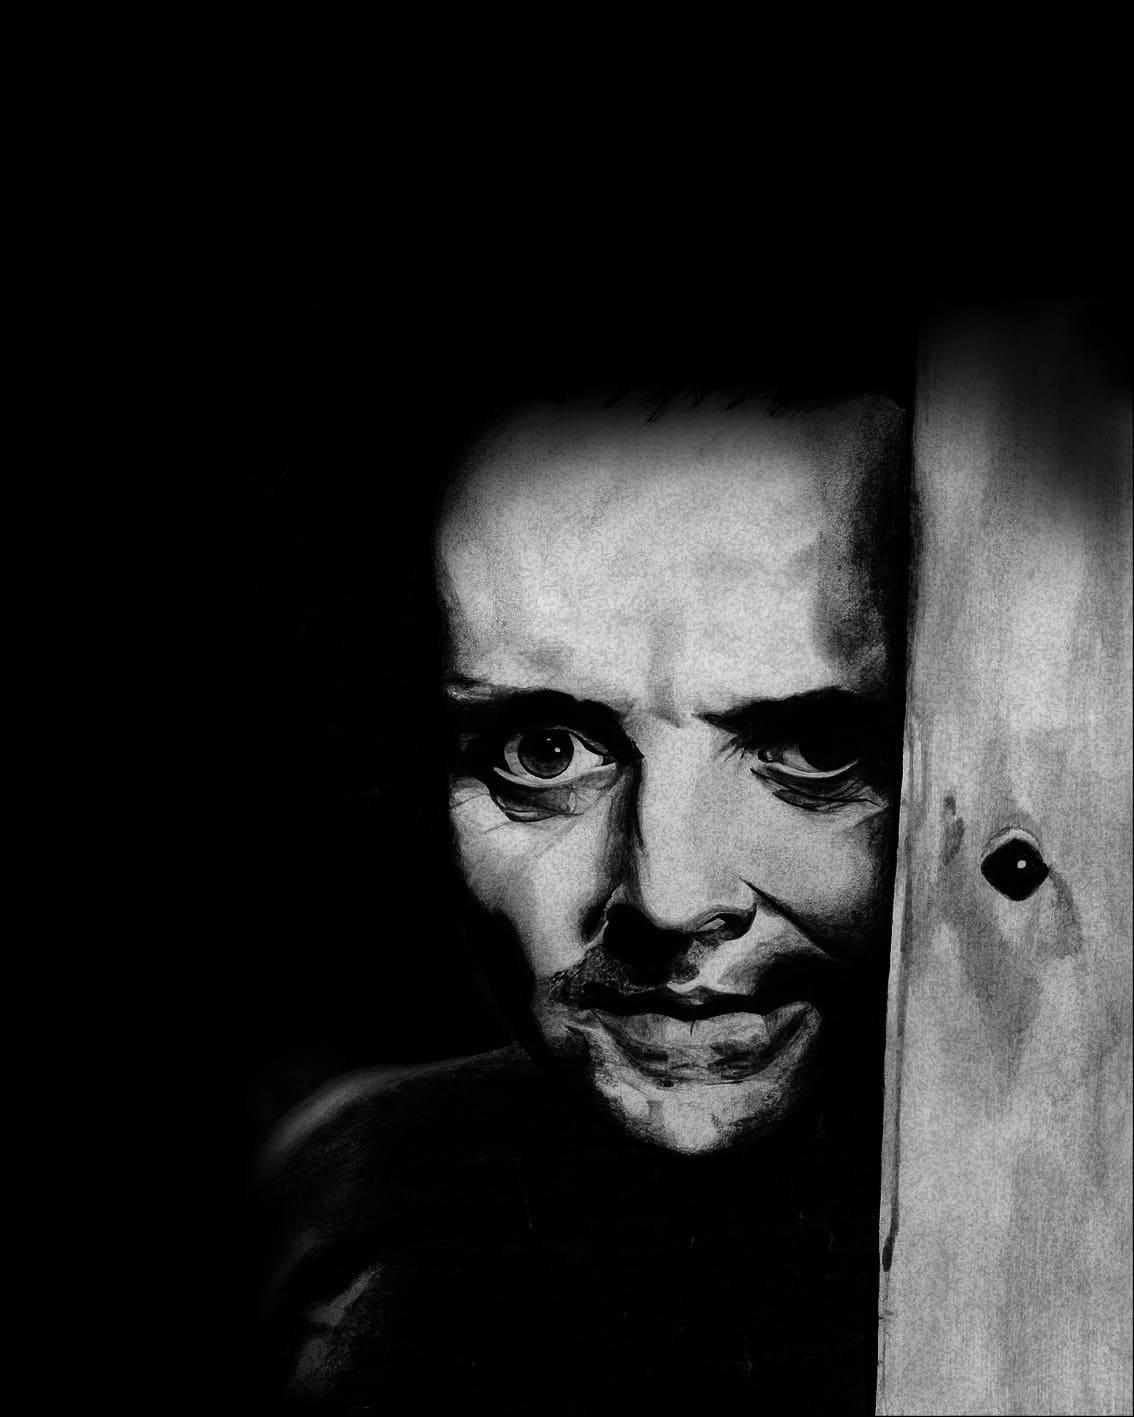 From my Illustration Portfolio - Hannibal Lecter Portrait